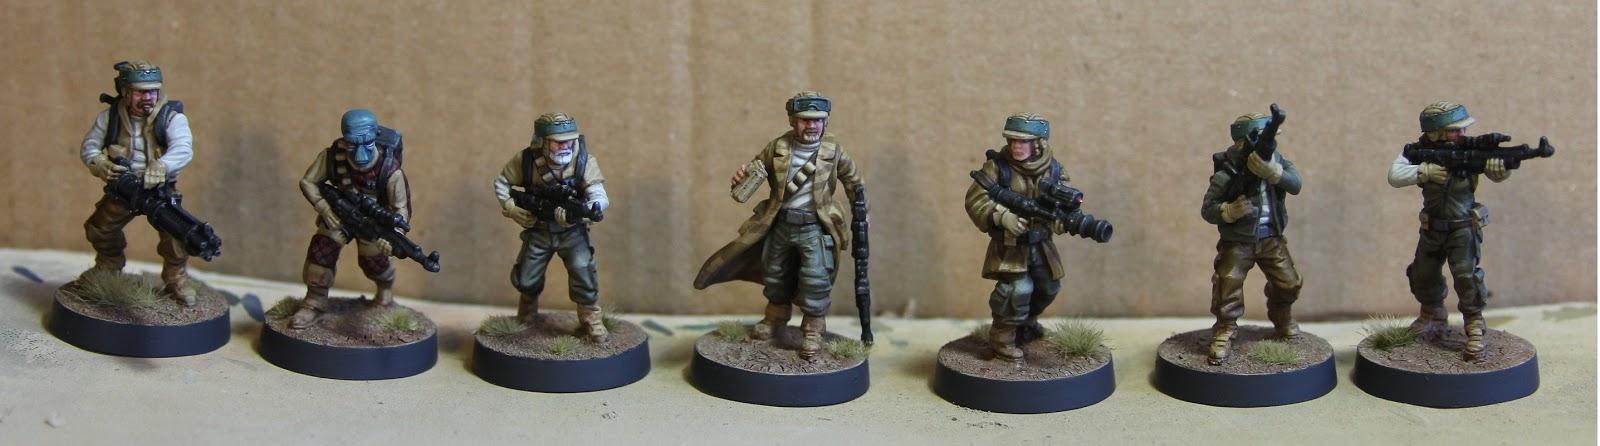 [Legion] Abregado Fusiliers - Fins Rebellen 1